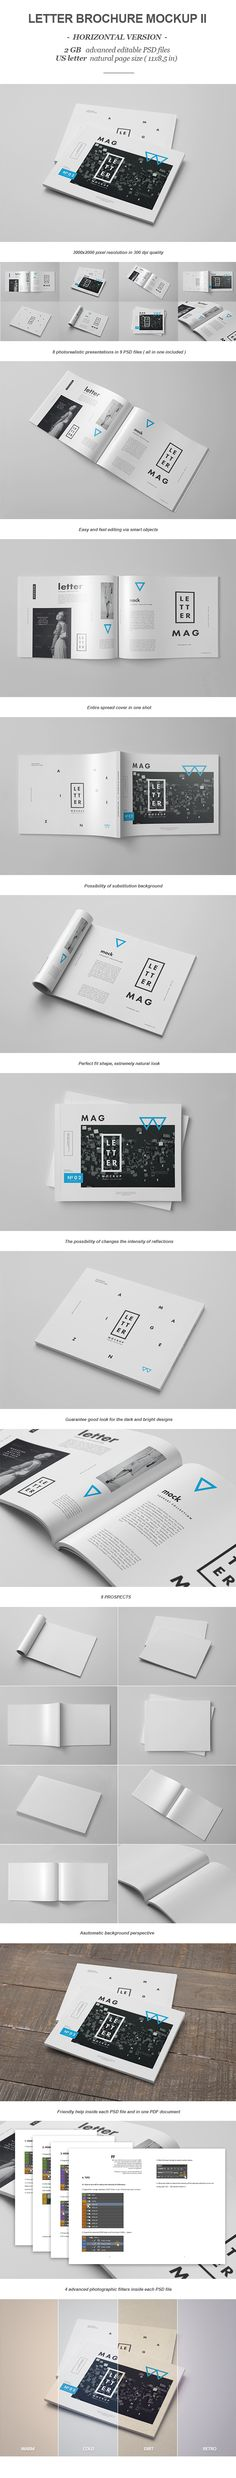 Buy Horizontal Letter Magazine / Brochure Mock-up 2 by on GraphicRiver. Letter Magazine / Brochure Mock-up 2 Photorealistic LETTER magazine/borchure/catalog mock-up. So much in 9 PSD files. Web Design, Design Typo, Layout Design, Print Design, Design Brochure, Booklet Design, Brochure Layout, Editorial Layout, Editorial Design